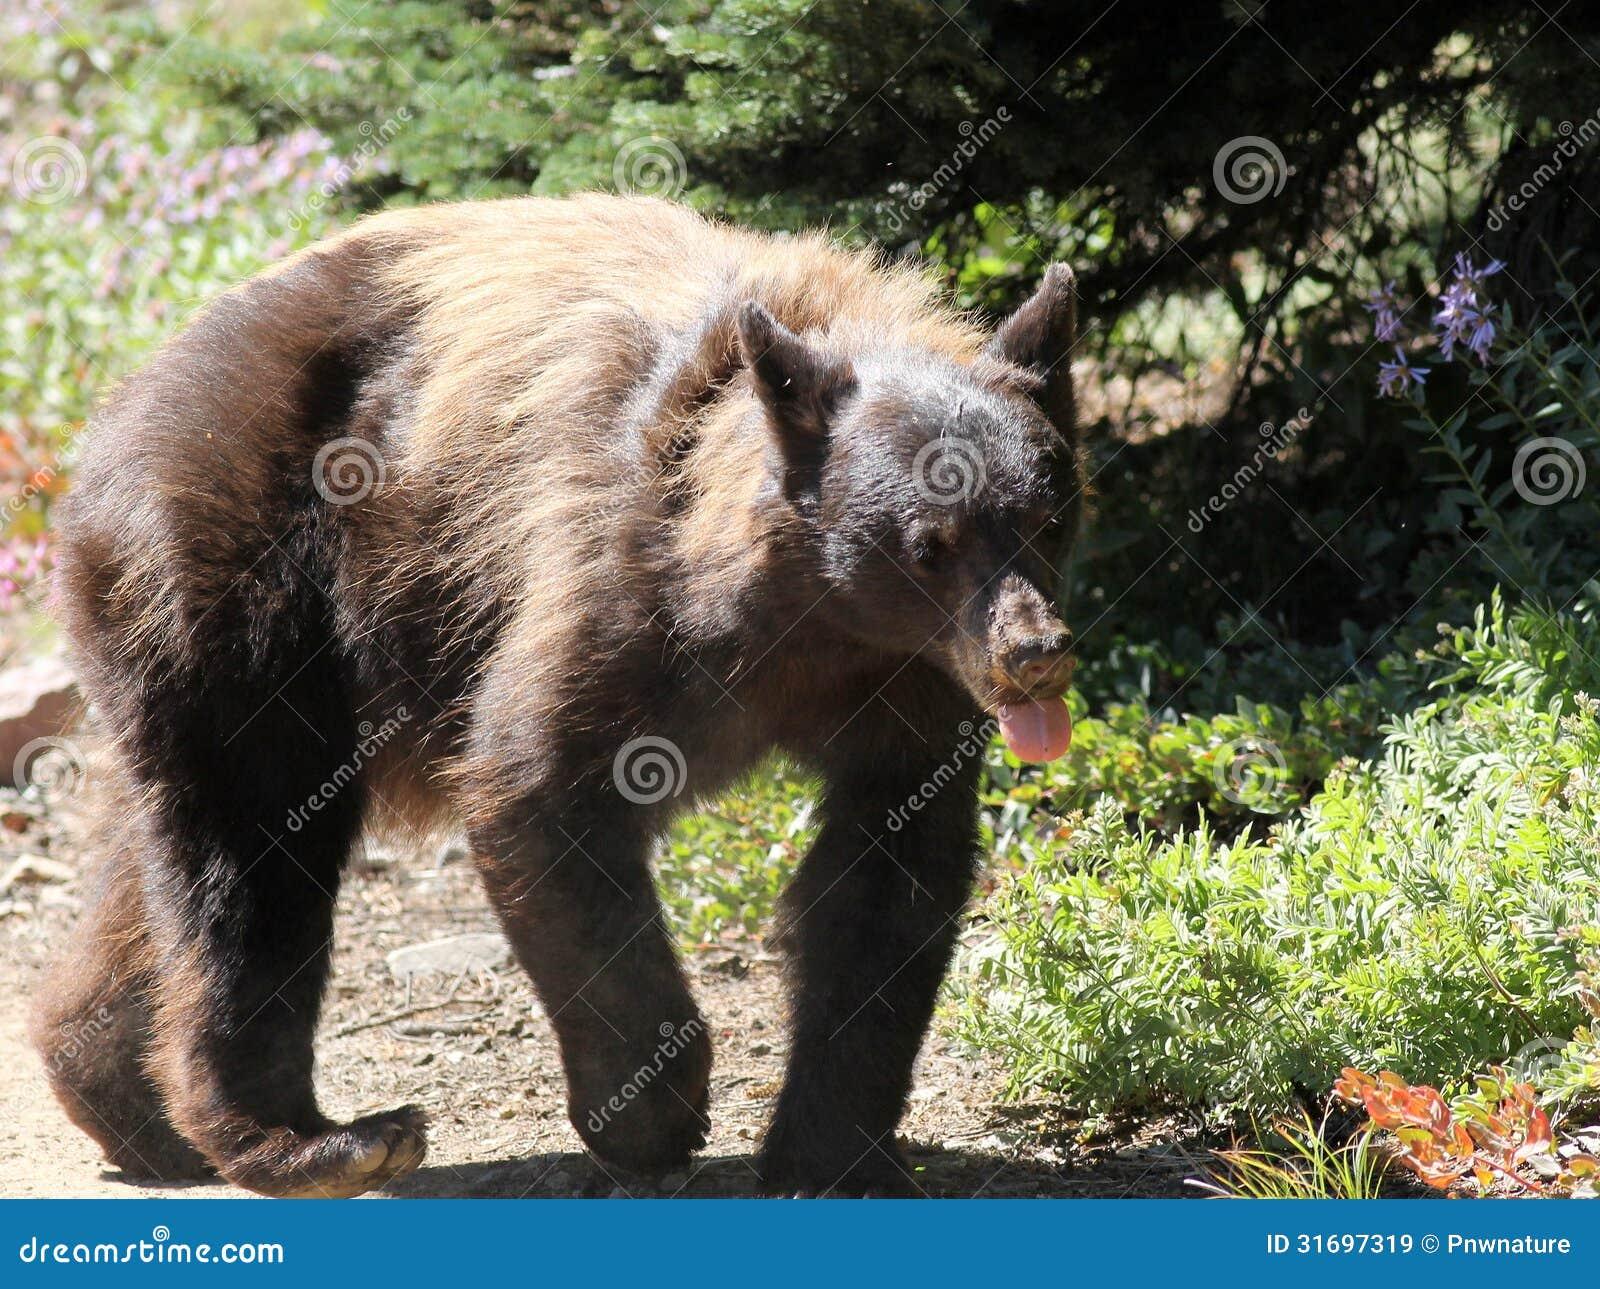 black singles in mount rainier I saw this half-grown black bear walking down the road at sunrise in mt rainier national park first bear i've ran across in the wild.